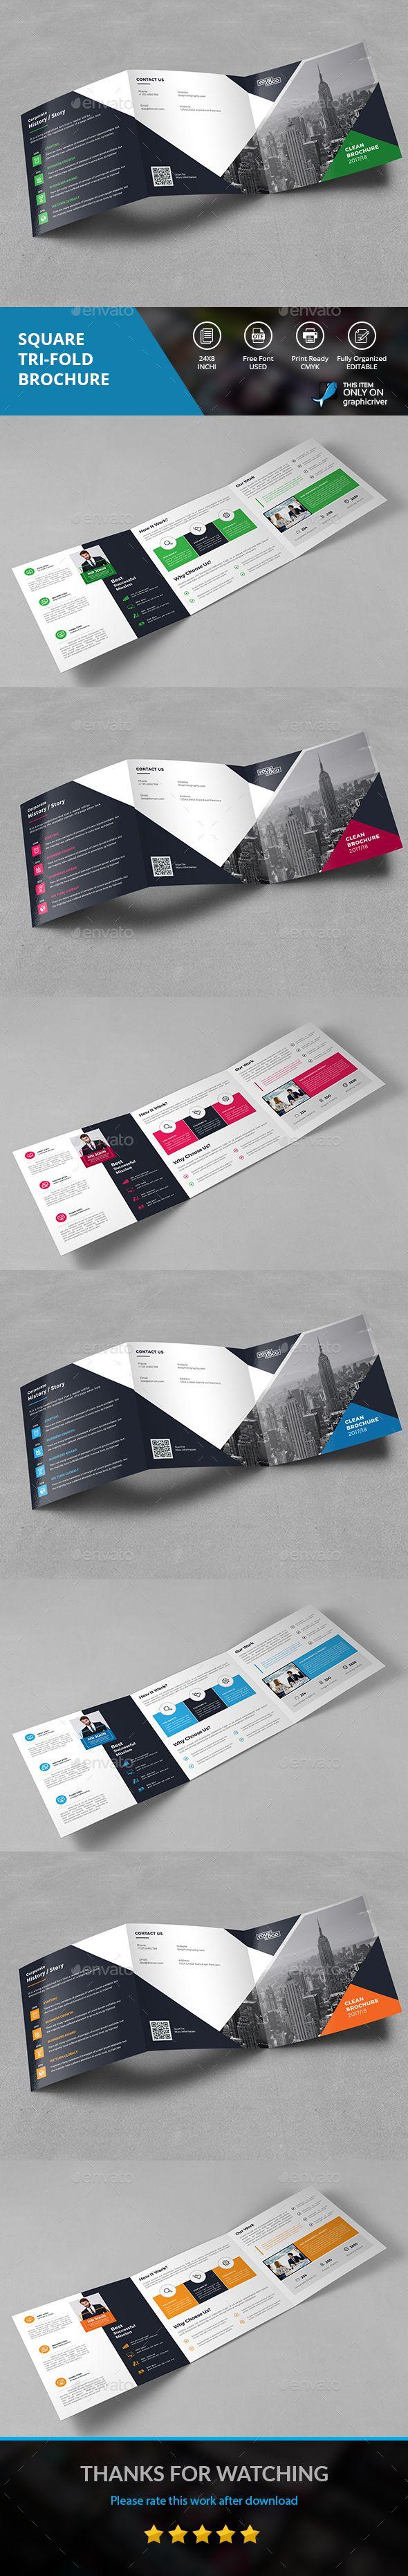 SQUARE TRI-FOLD - Corporate Brochures Download here : https://graphicriver.net/item/square-trifold/19658297?s_rank=86&ref=Al-fatih